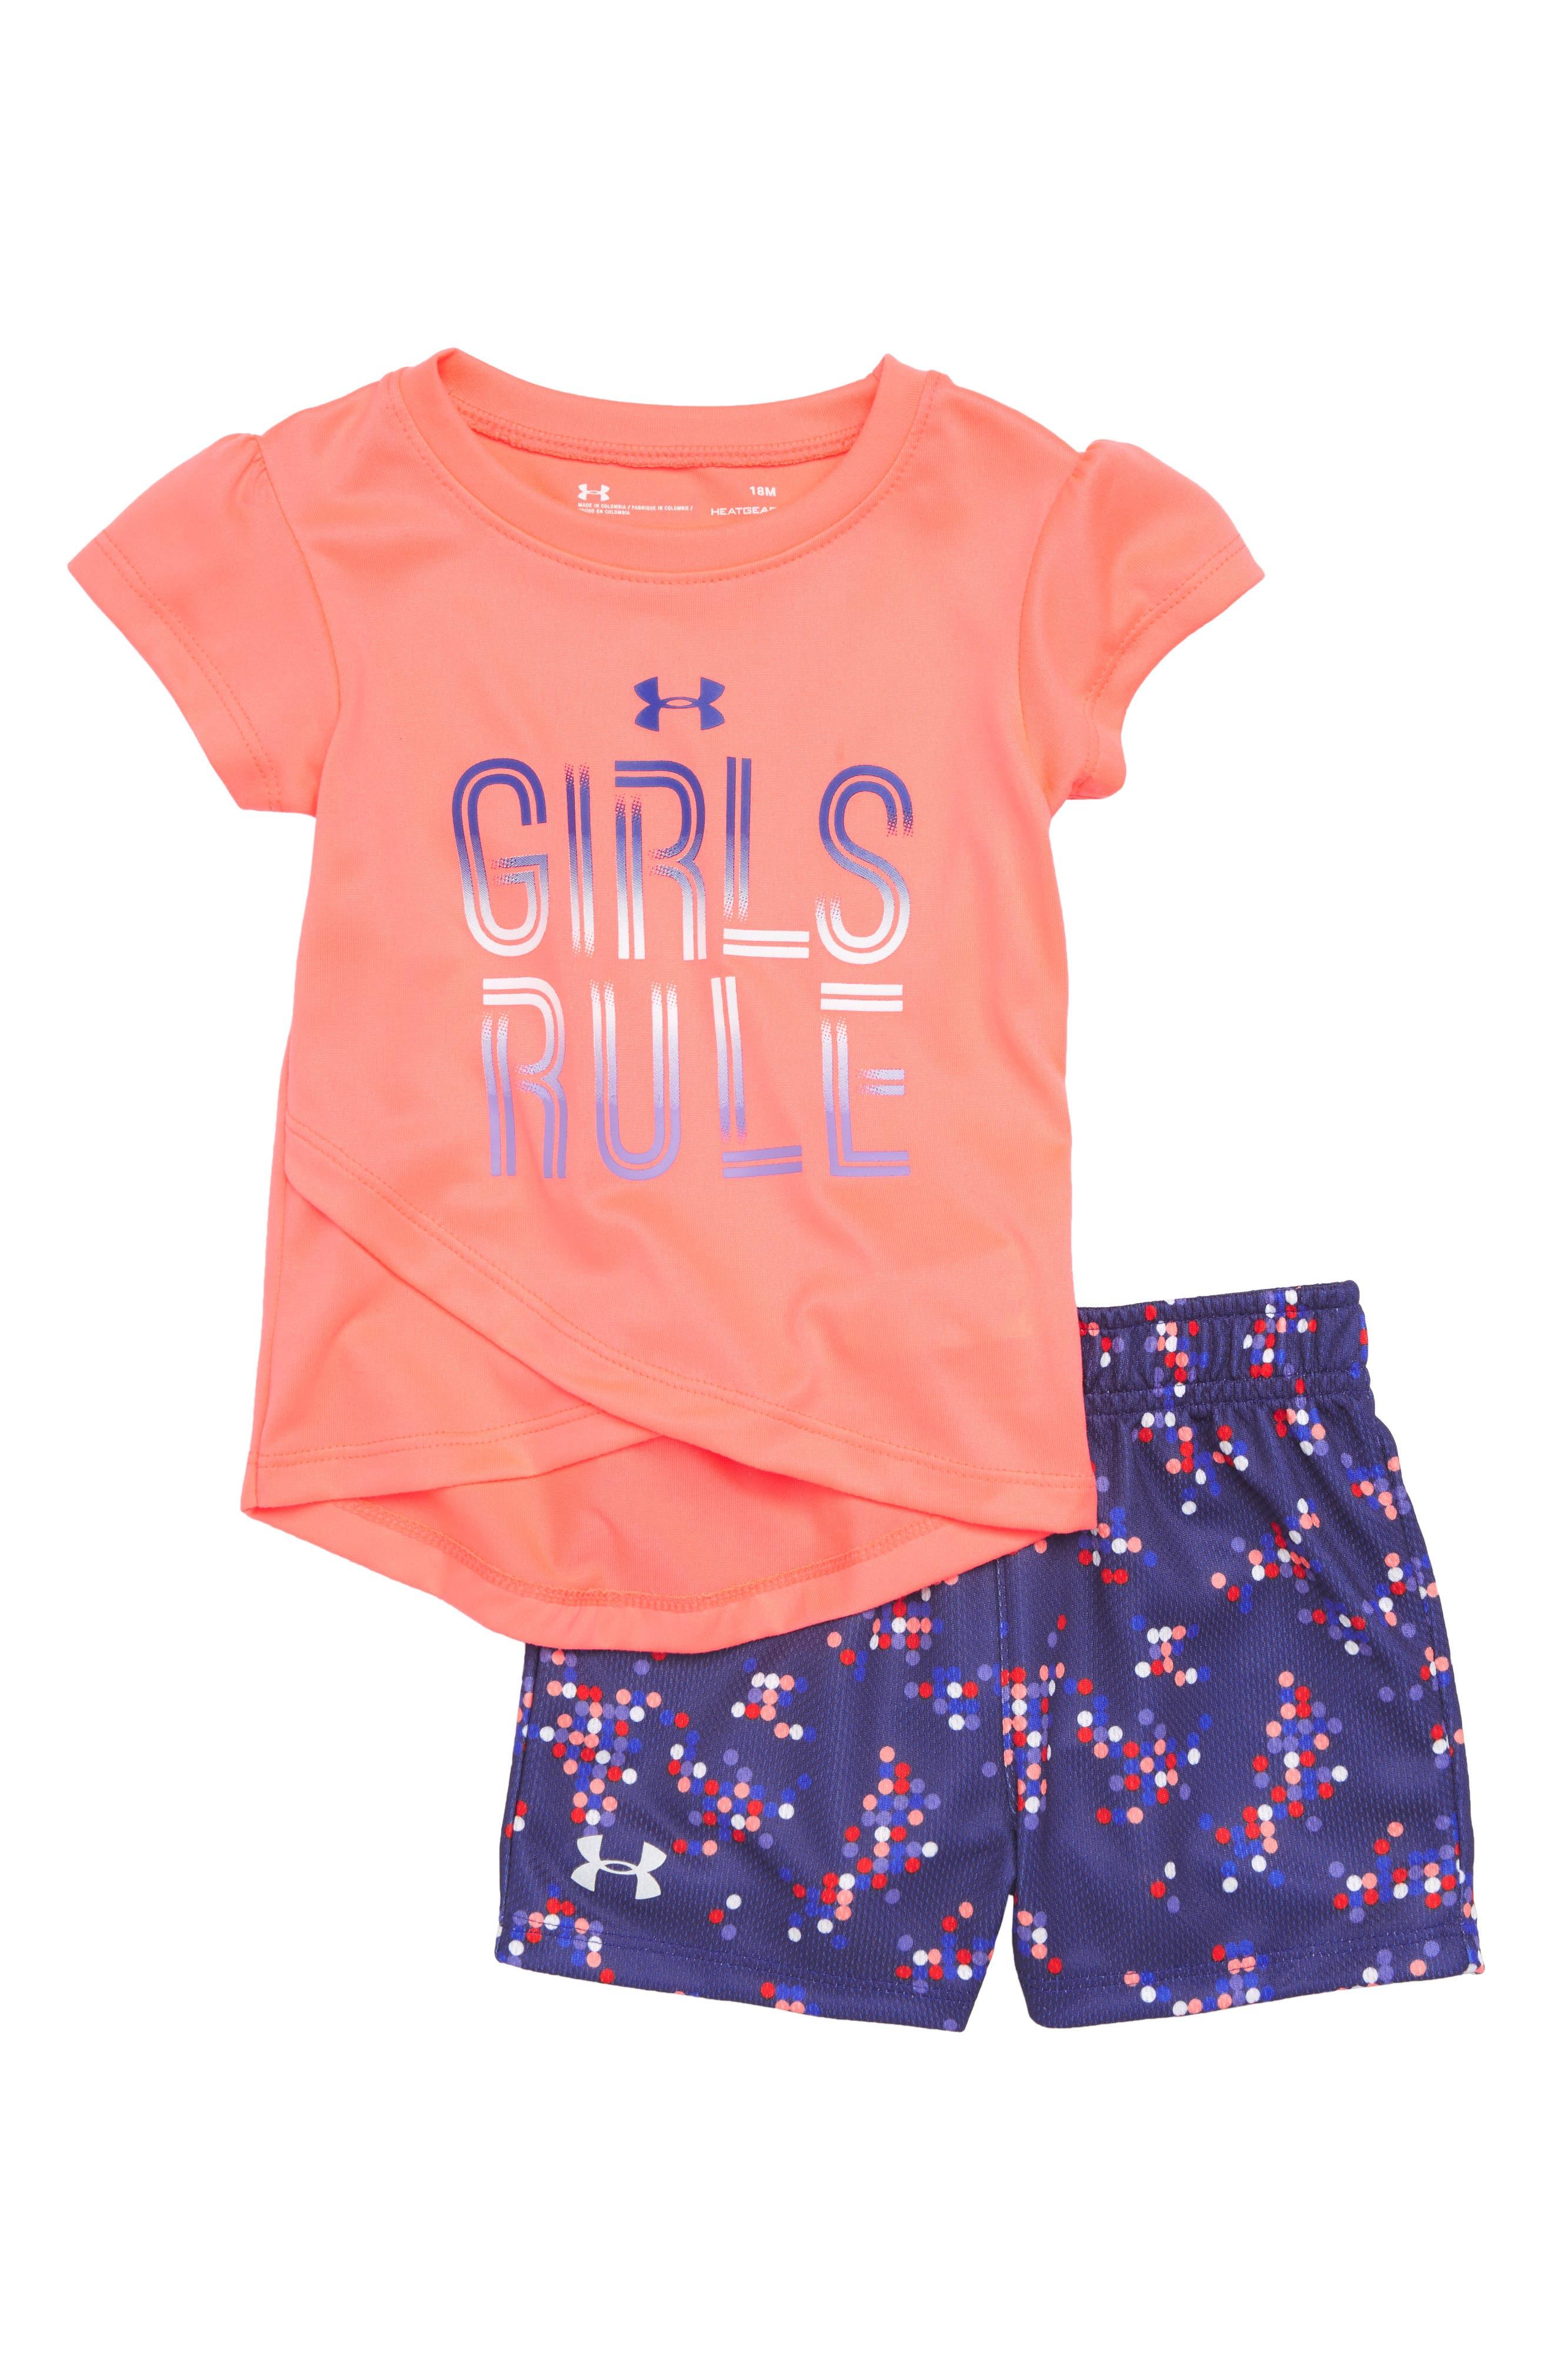 Girls Rule Tee & Shorts Set,                         Main,                         color, Brillance